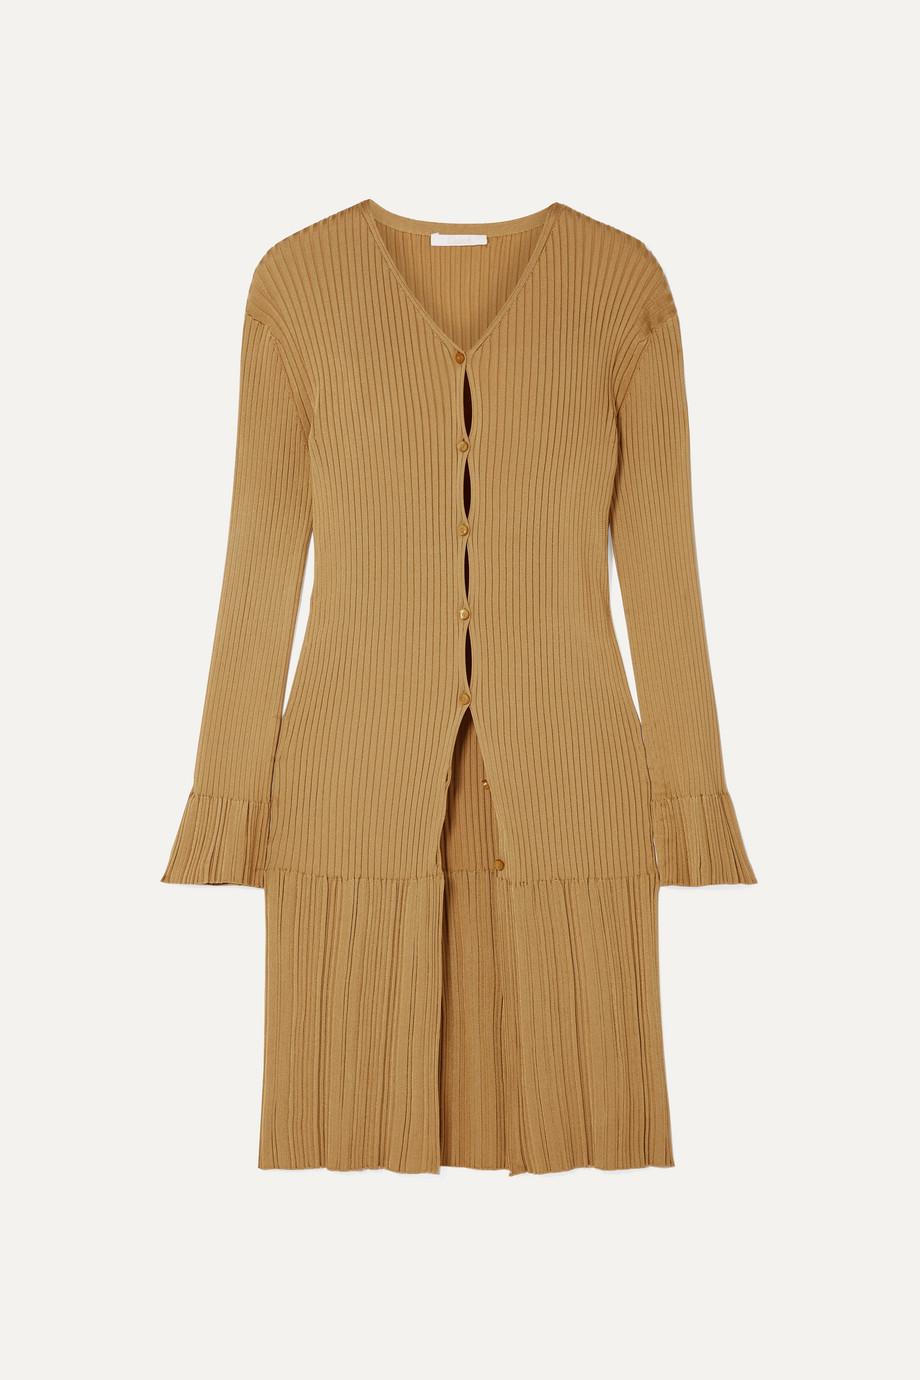 Chloé Ribbed-knit cardigan